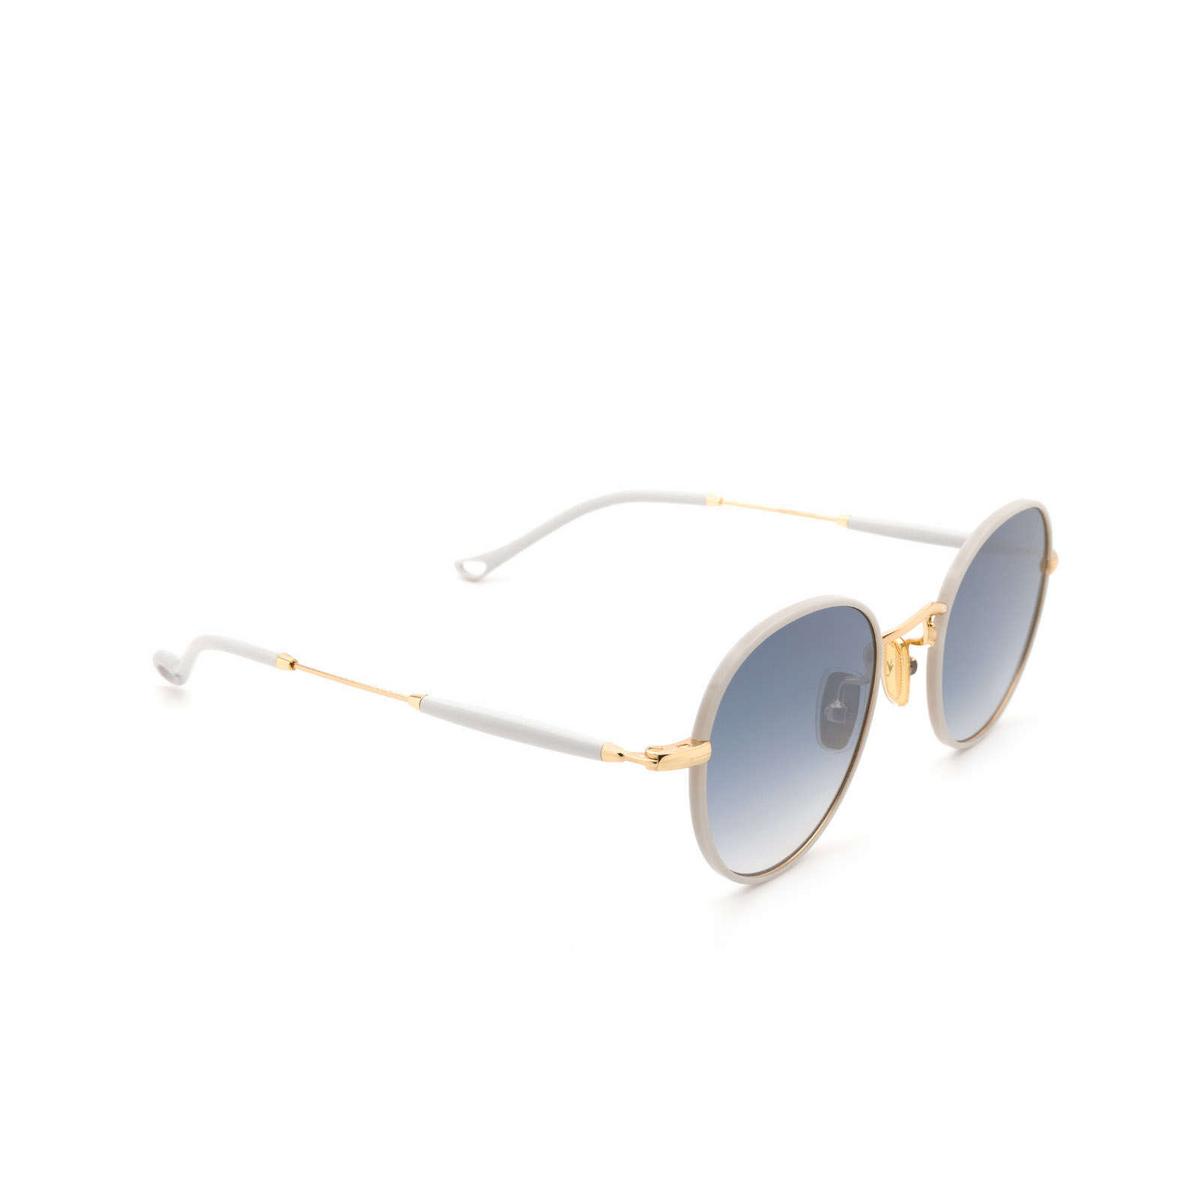 Eyepetizer® Round Sunglasses: Cinq color Ice Grey C.4-D-S-26F - three-quarters view.